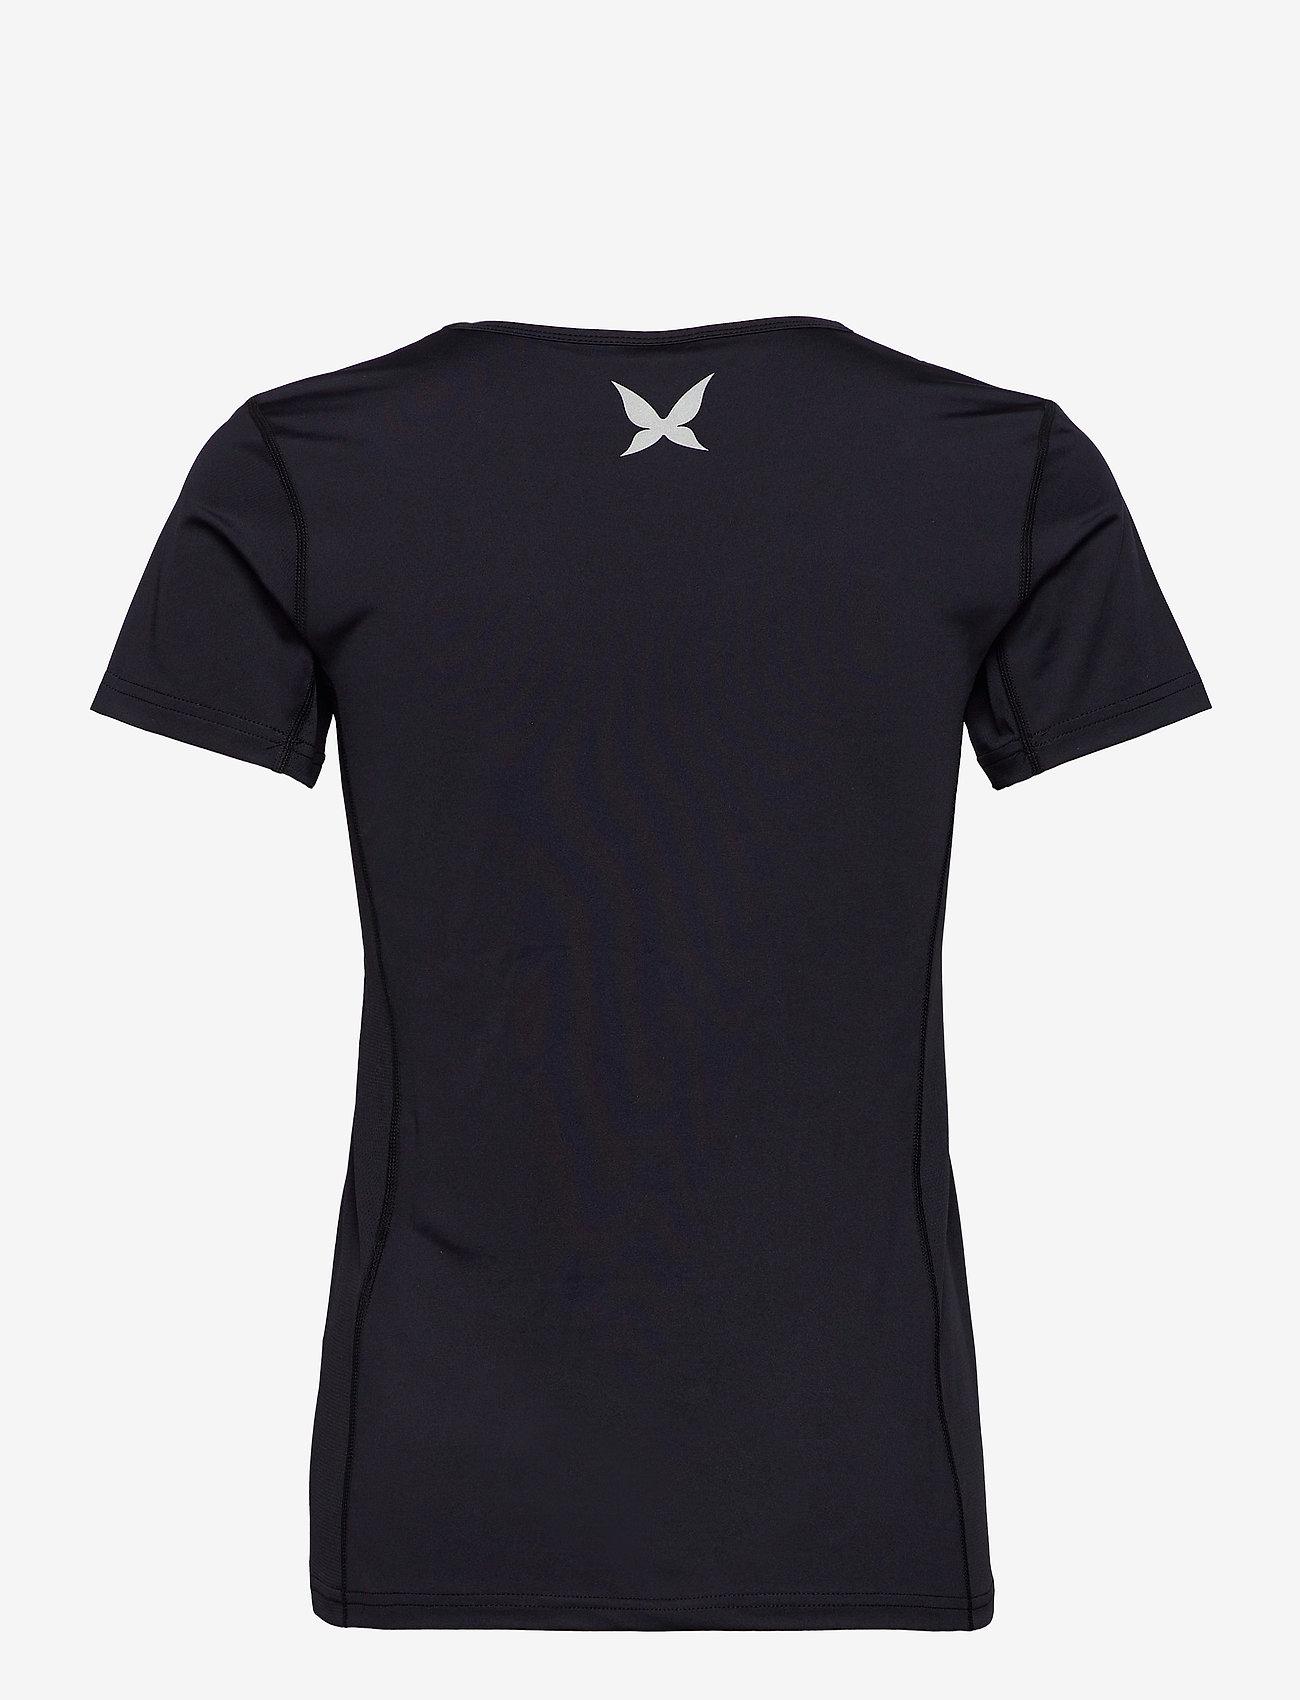 Kari Traa - NORA TEE - t-shirts - black - 1